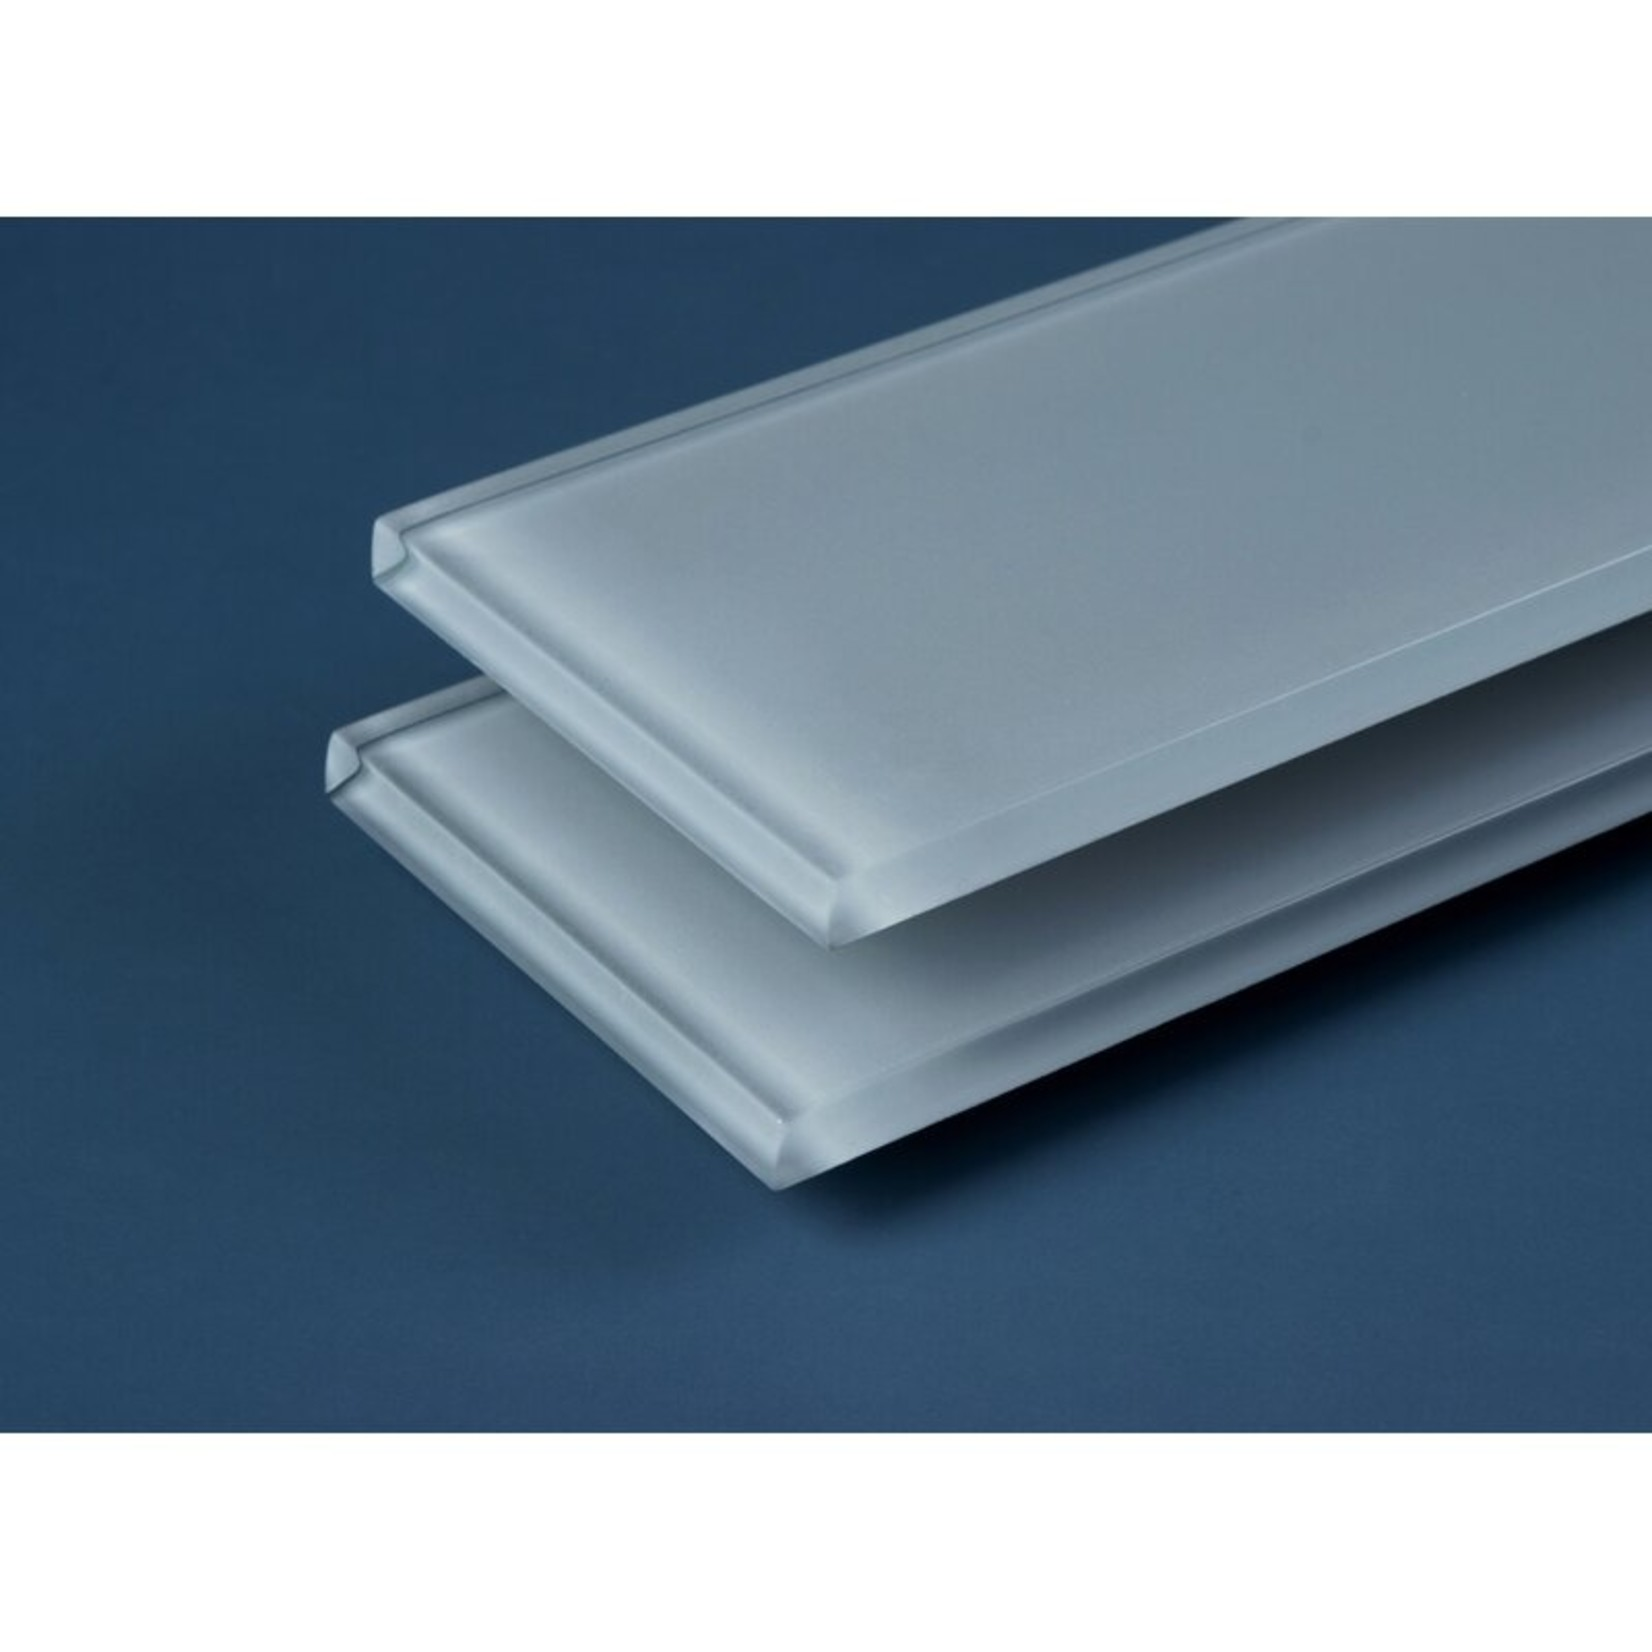 "*Premium 3"" x 9"" Glass Subway Tile - Moonlight Grey - 5 Sq. Ft."